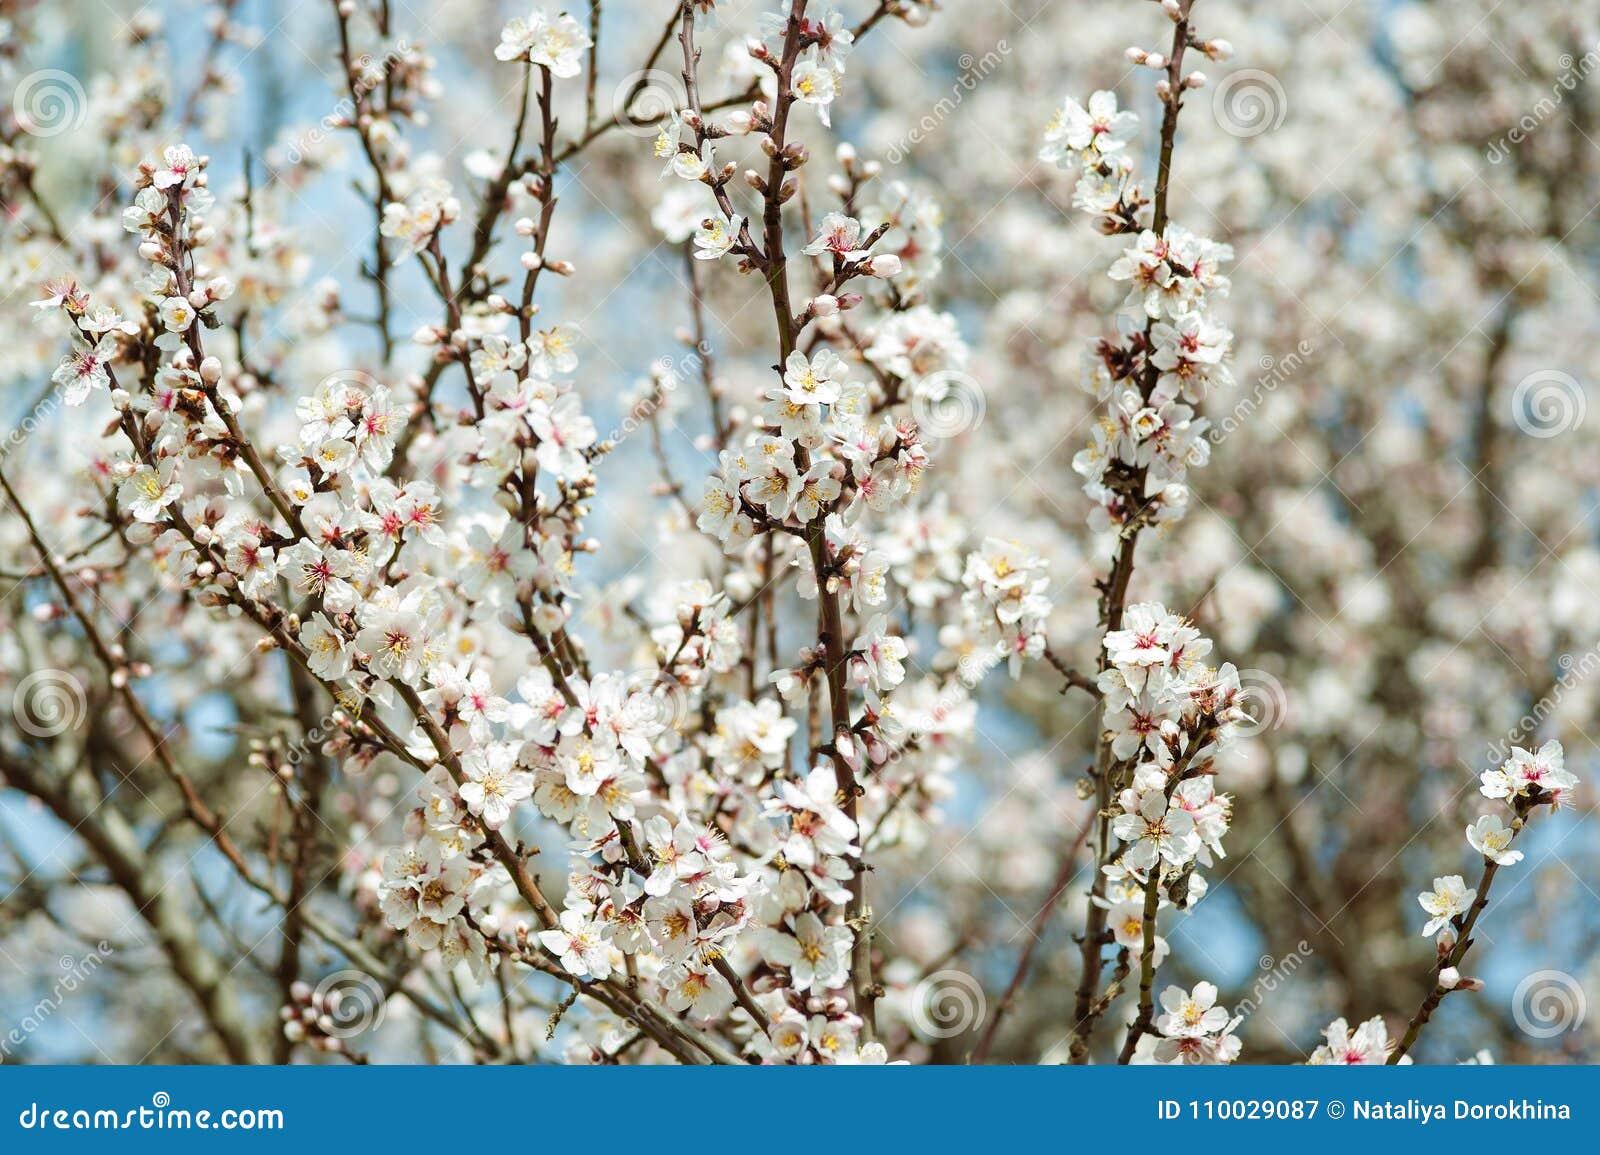 Abrikozenbloemen in de lente, bloemenachtergrond